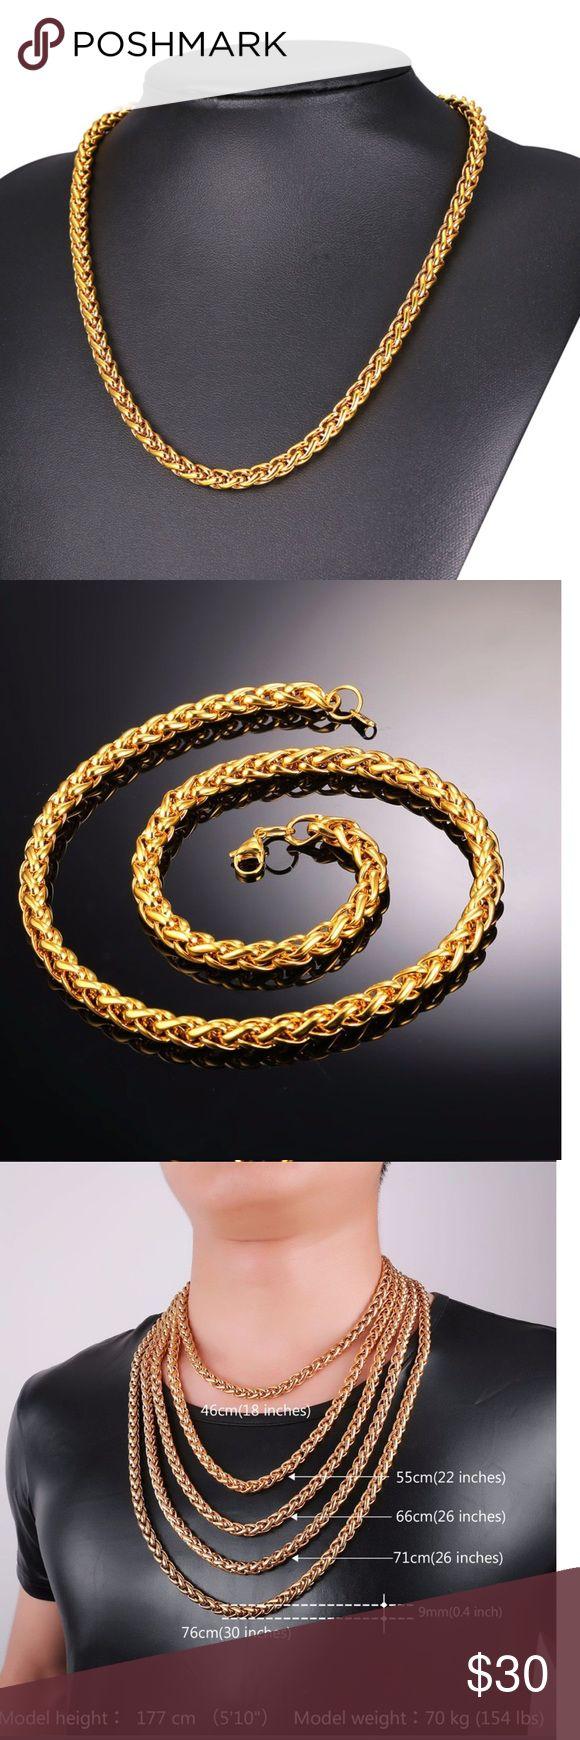 9mm New 18k Gold Chain For Men Brand New Stainless Steel Chain For Men 9mm